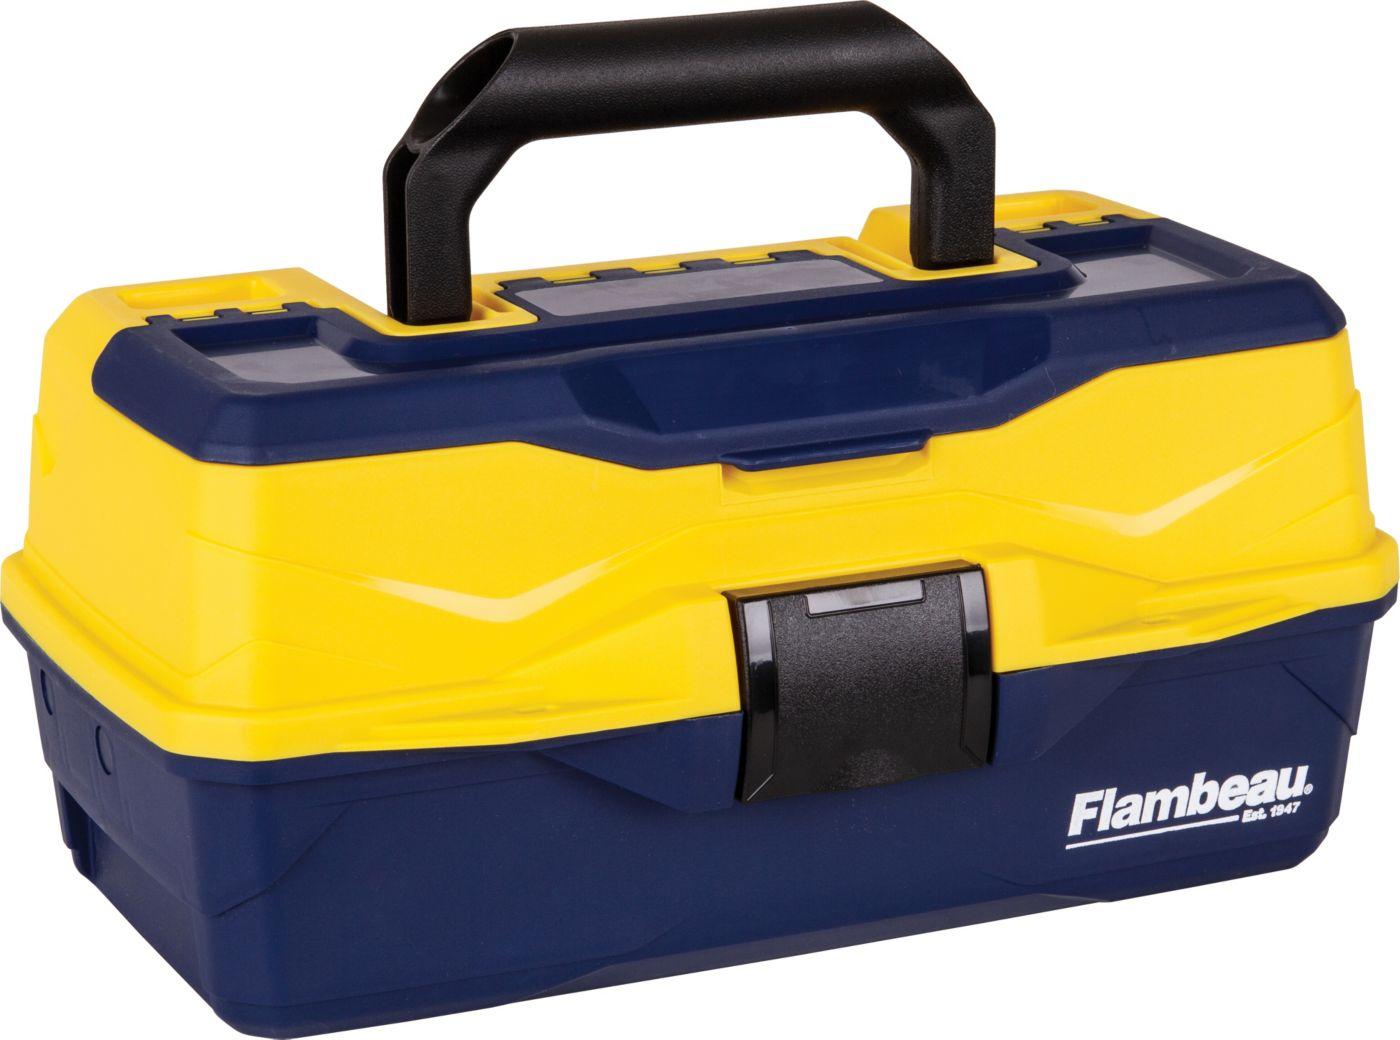 Flambeau Adventurer Kid's 1-Tray Tackle Box with Starter Kit